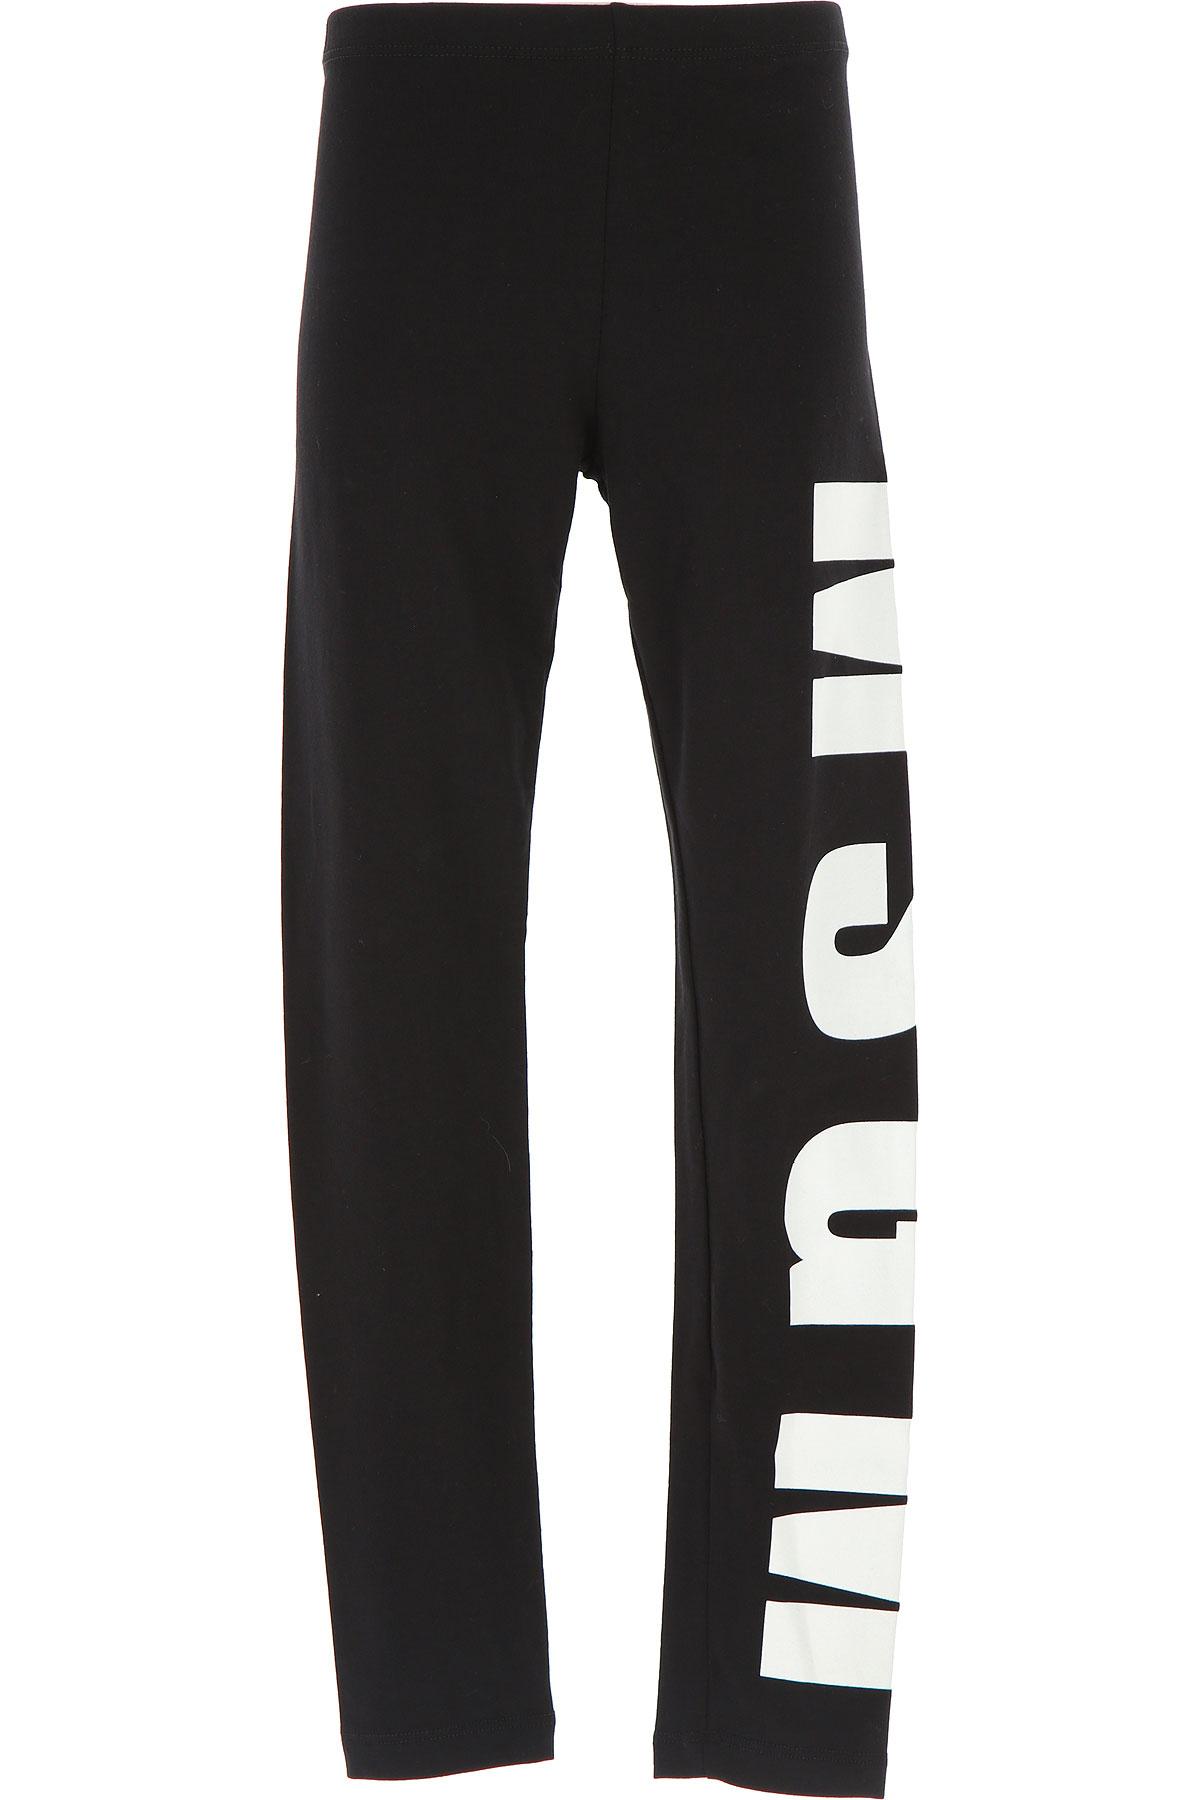 Image of MSGM Kids Pants for Girls, Black, Cotton, 2017, 10Y 14Y 4Y 6Y 8Y